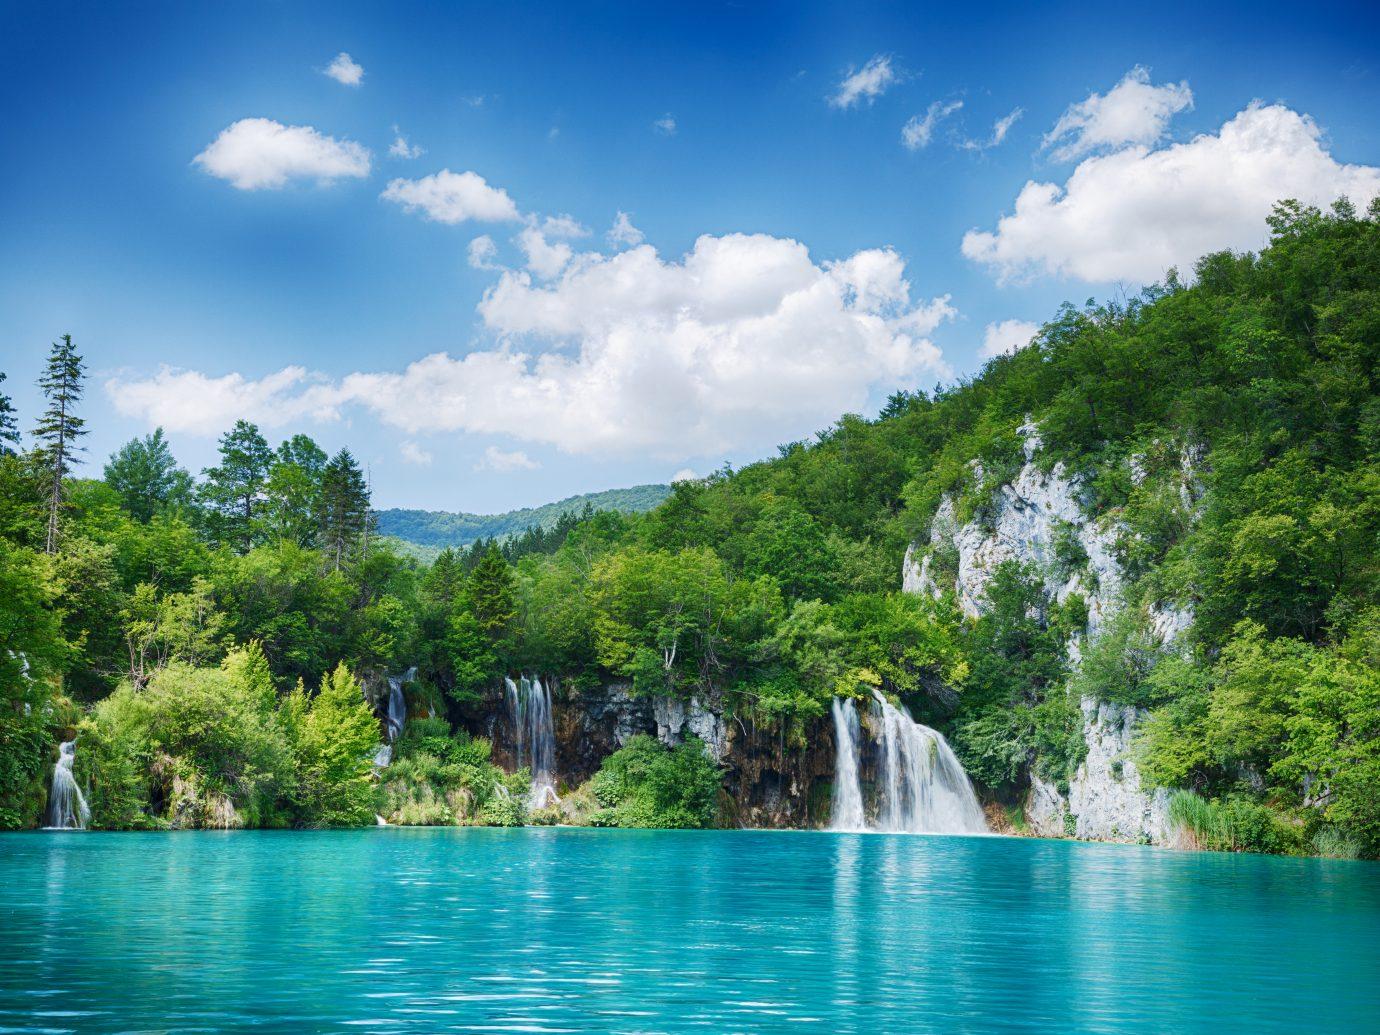 Idyllic scene from the Plitvice Lakes National Park